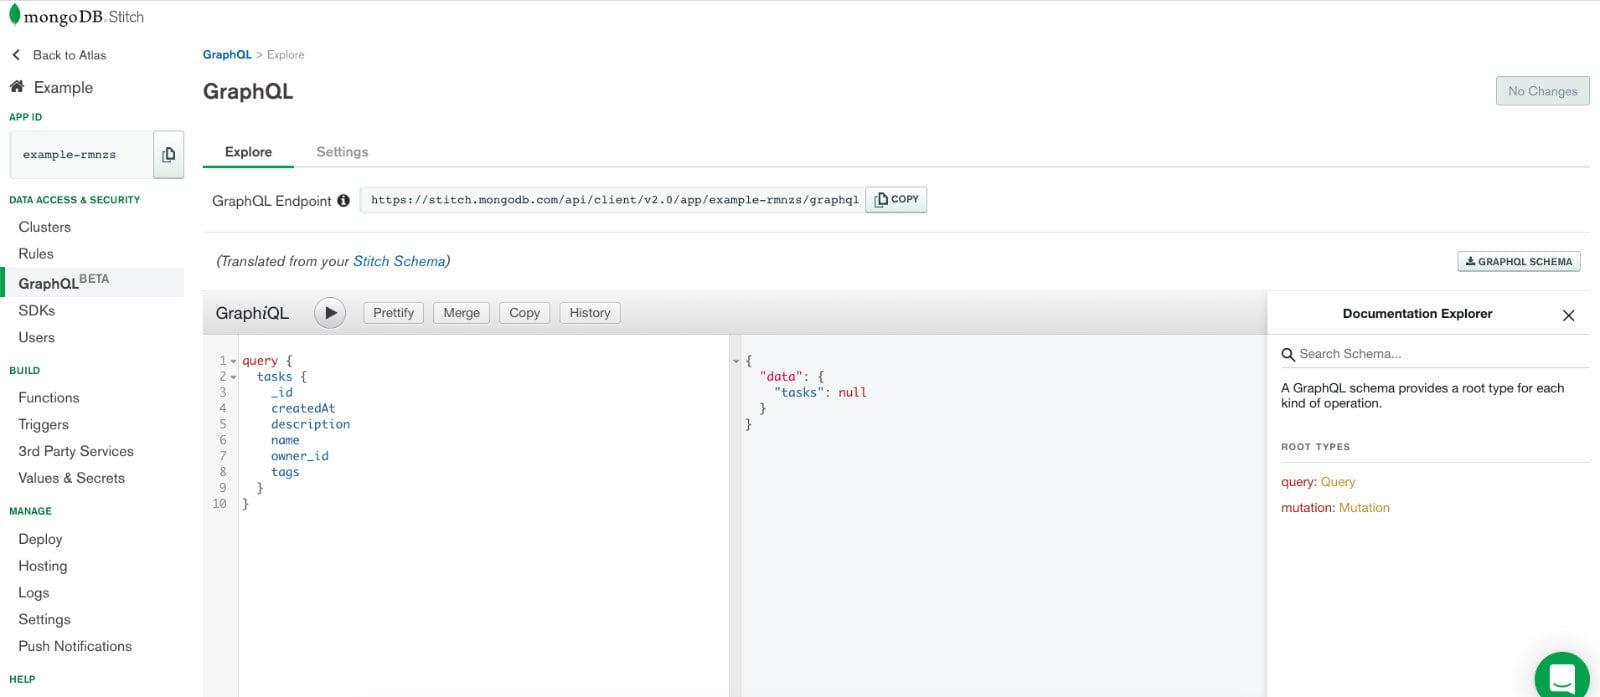 MongoDB Stitch GraphQL